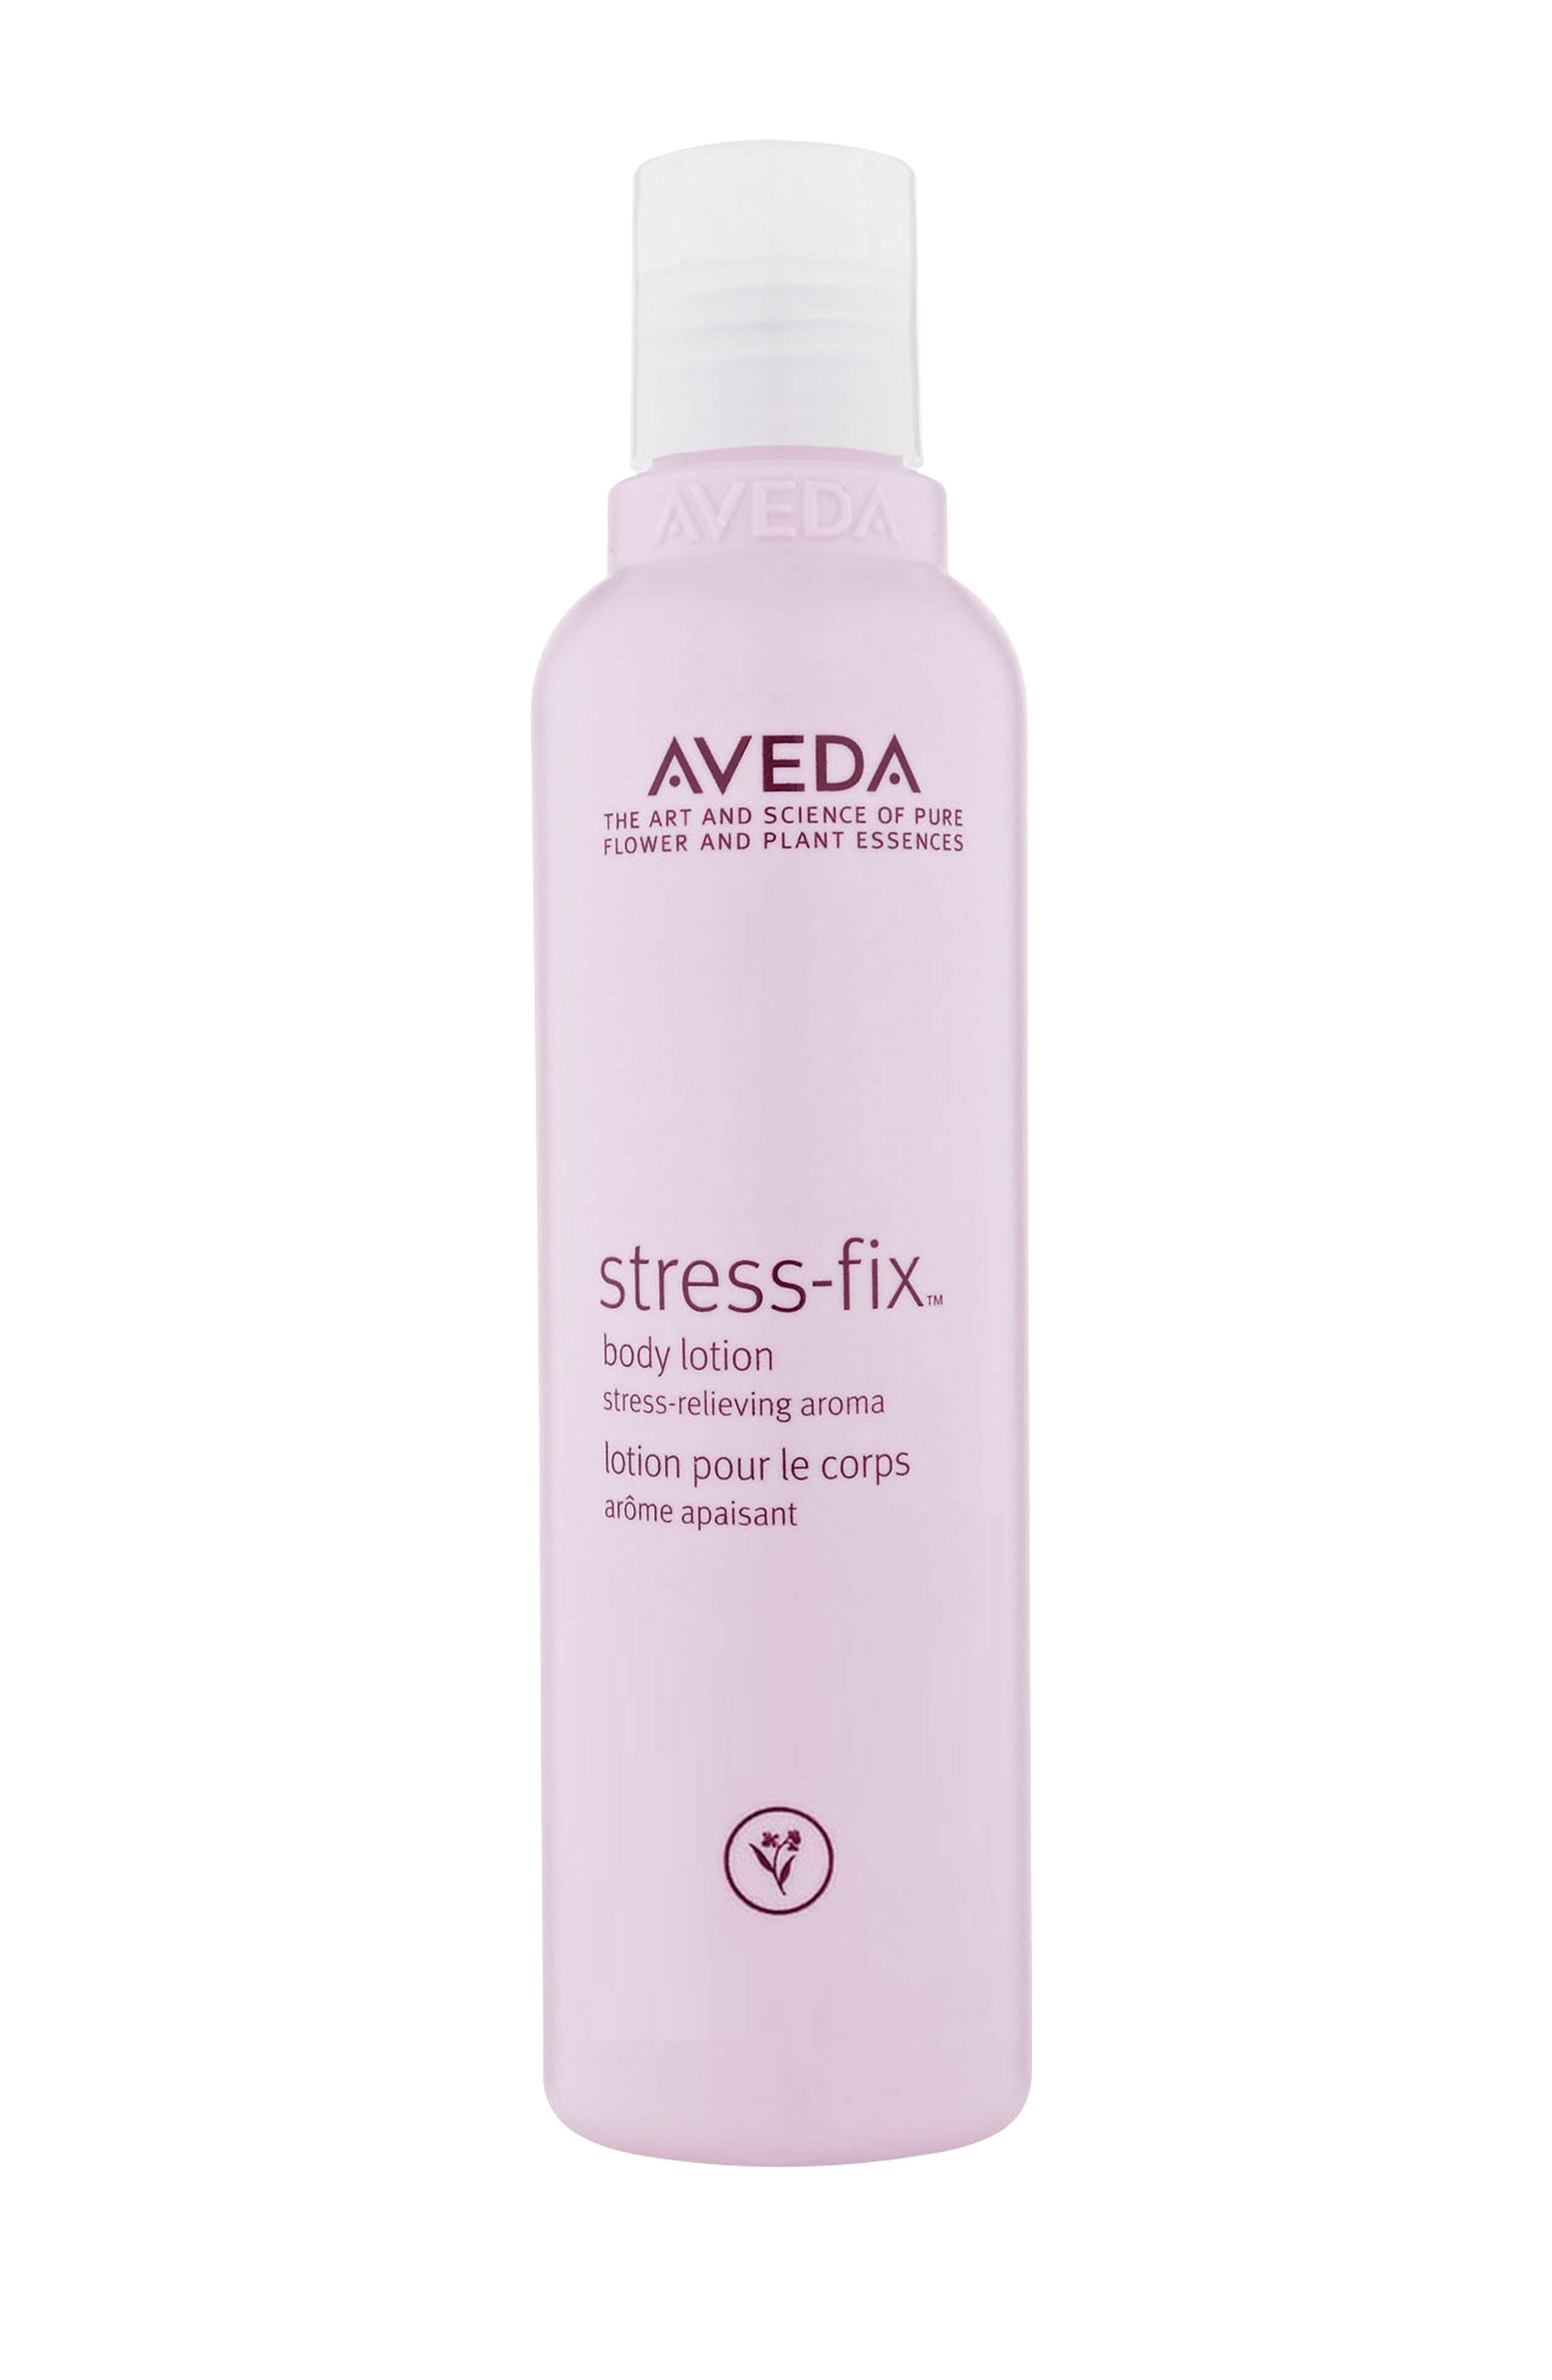 Aveda stress-fix lozione corpo 200 ml, Viola, large image number 0